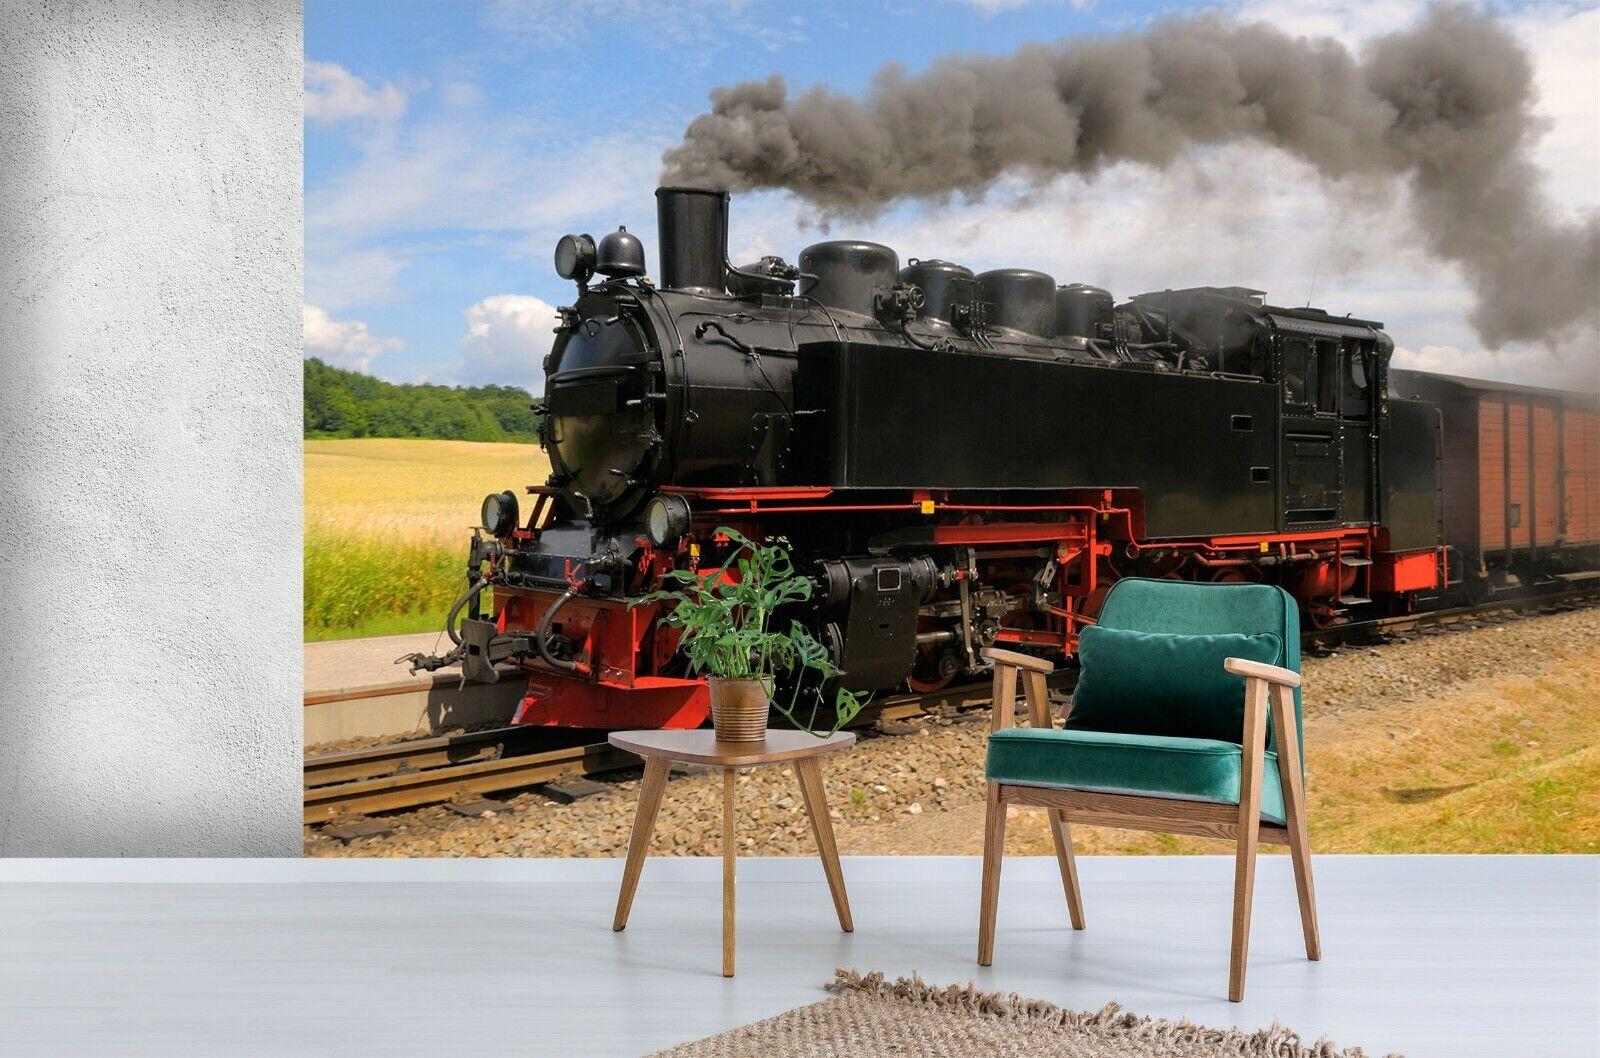 3D Train Smoke N838 Transport Wallpaper Mural Self-adhesive Removable Amy